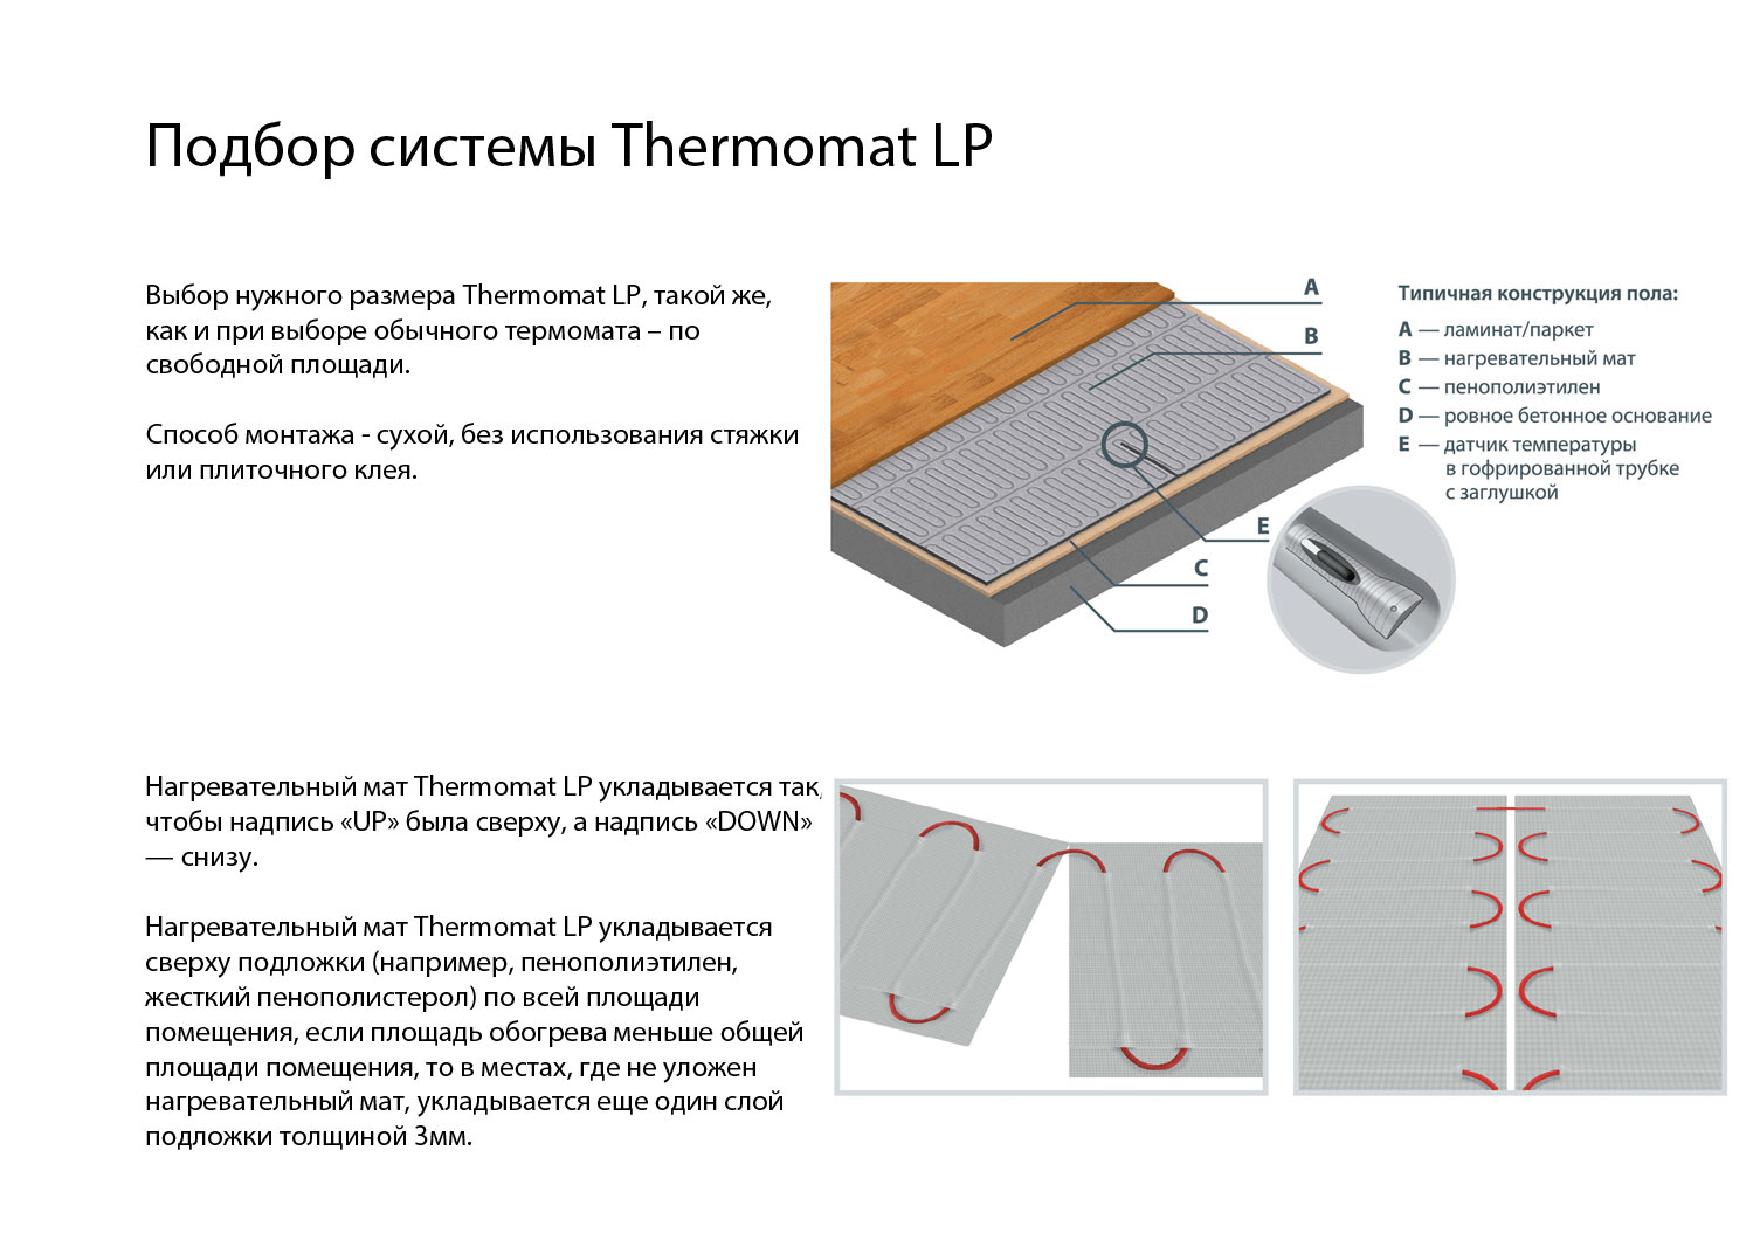 Podbor-sistemyi-Thermomat-LP